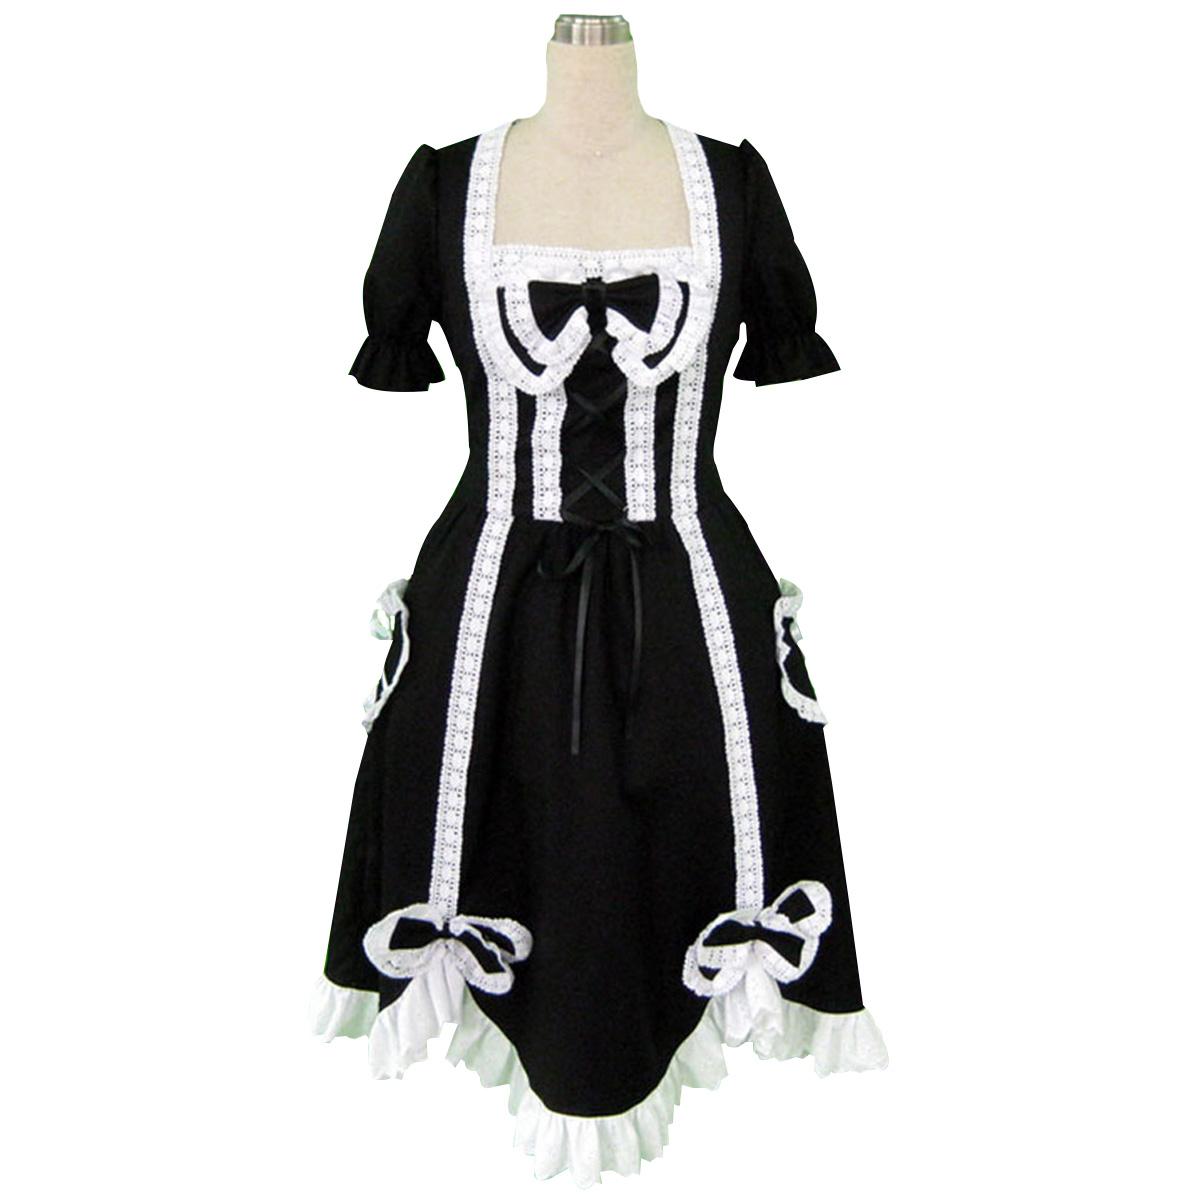 luxus lolita kultur mit kurzen rmeln lange kleider 2 faschingskost me cosplay kost. Black Bedroom Furniture Sets. Home Design Ideas